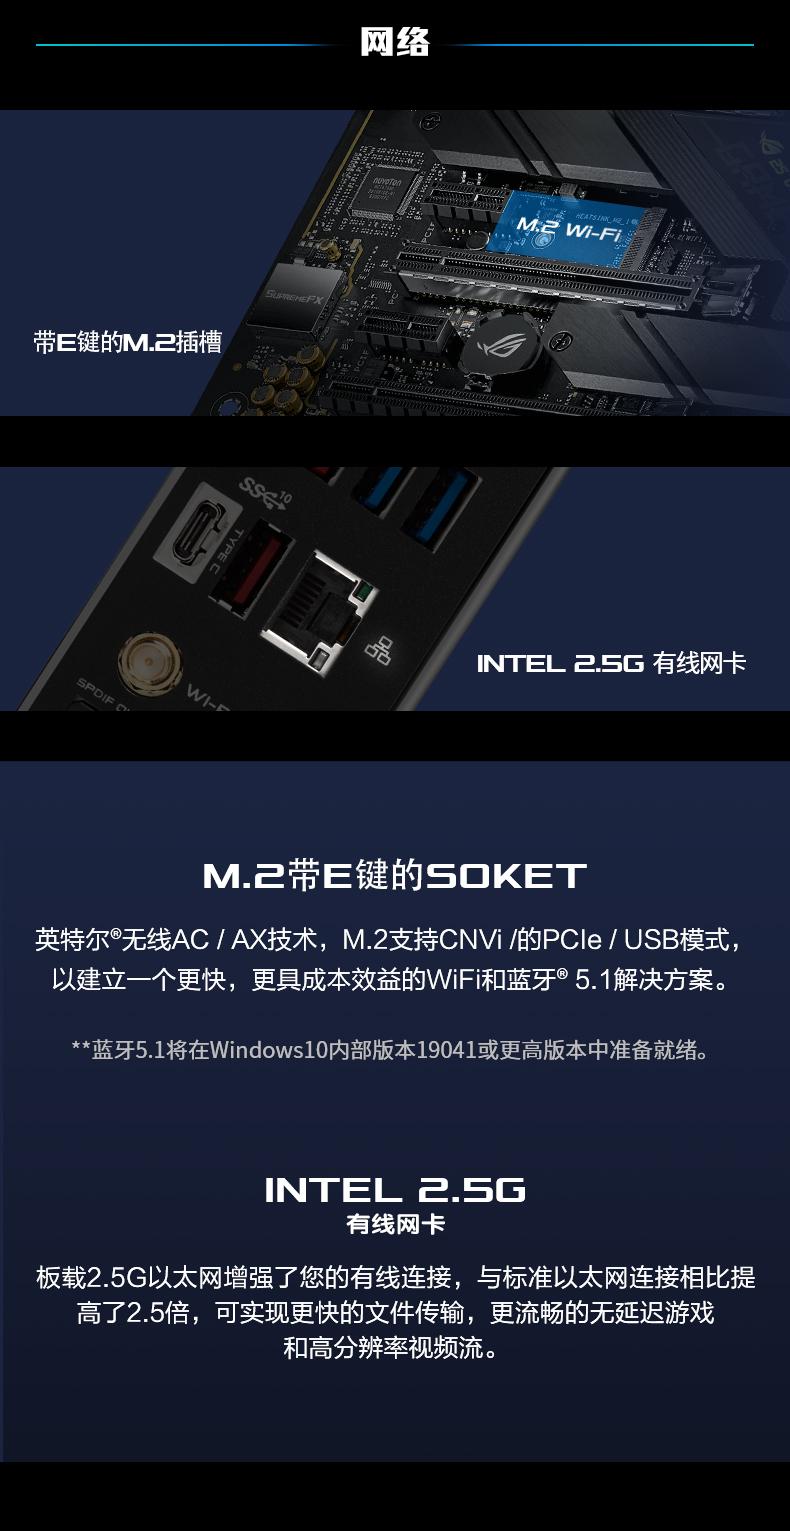 华硕 Asus 玩家国度 ROG STRIX Z490-F GAMING ATX Motherboard 主板 Z490 LGA1200 英特尔主板 Intel主板